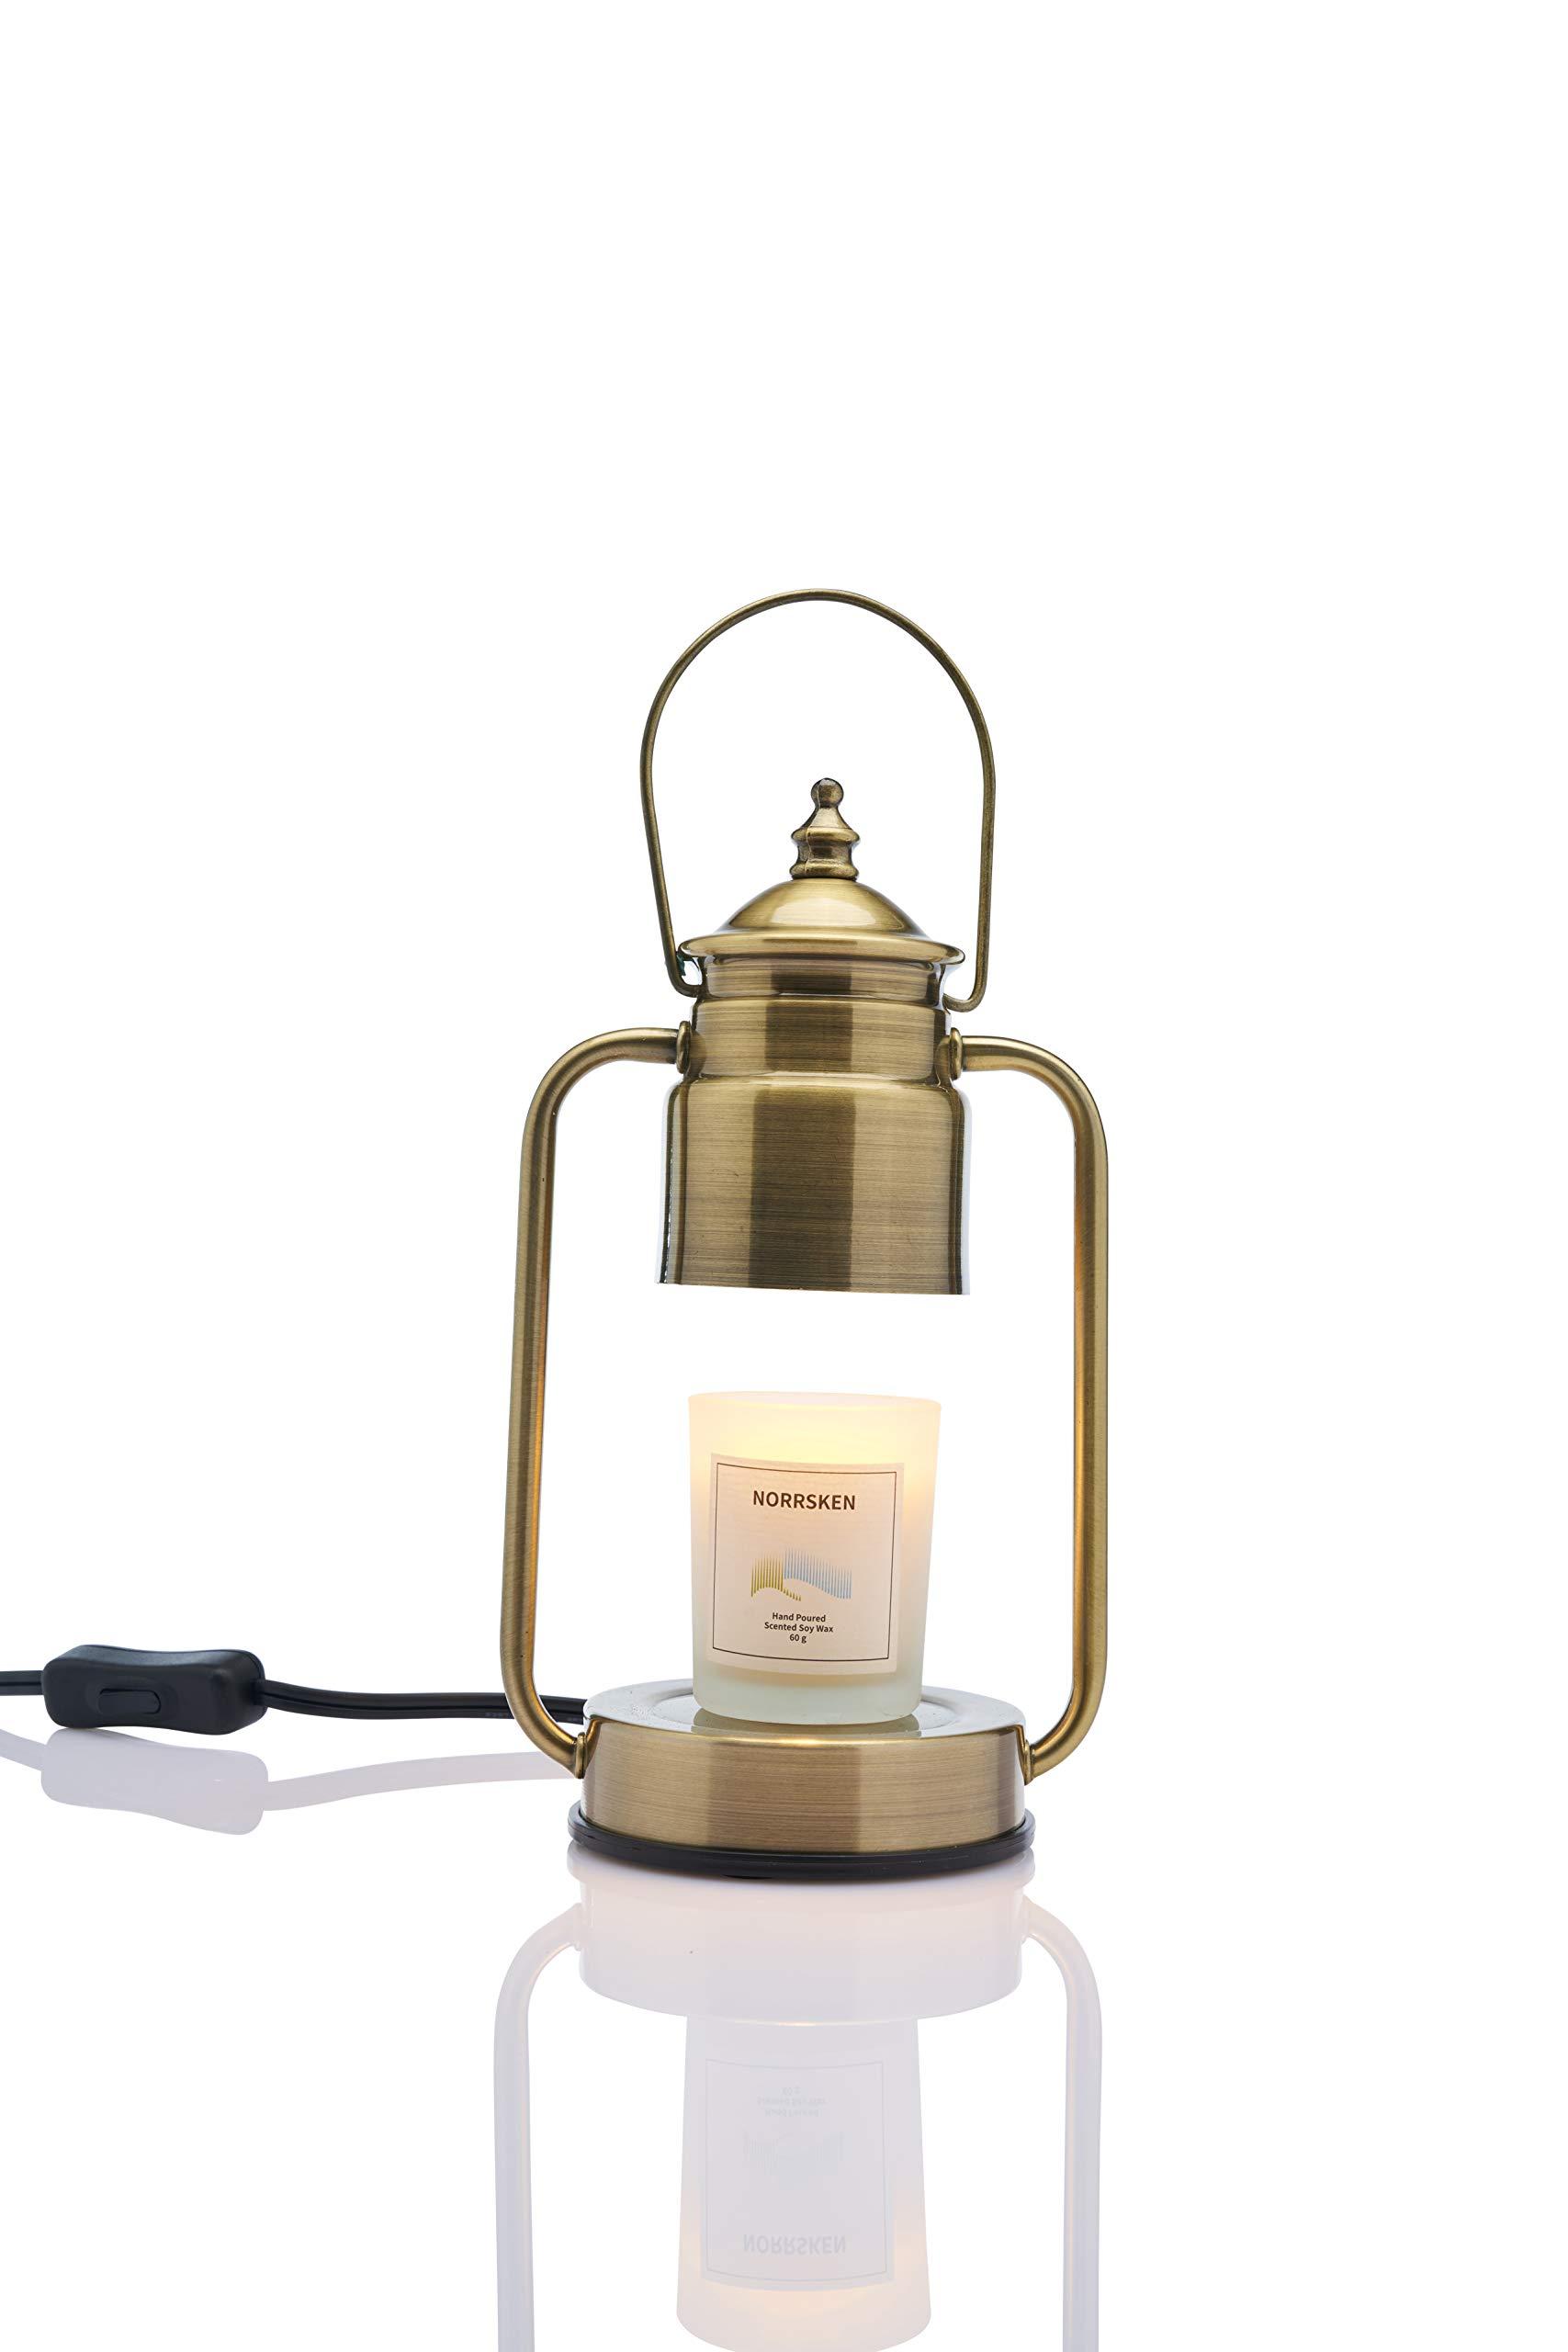 Vana Candles Candle Warmer Ljusvärmare Lykta Mini Vintage Lamp Lantern Swedish Design - Brushed Metal Gold